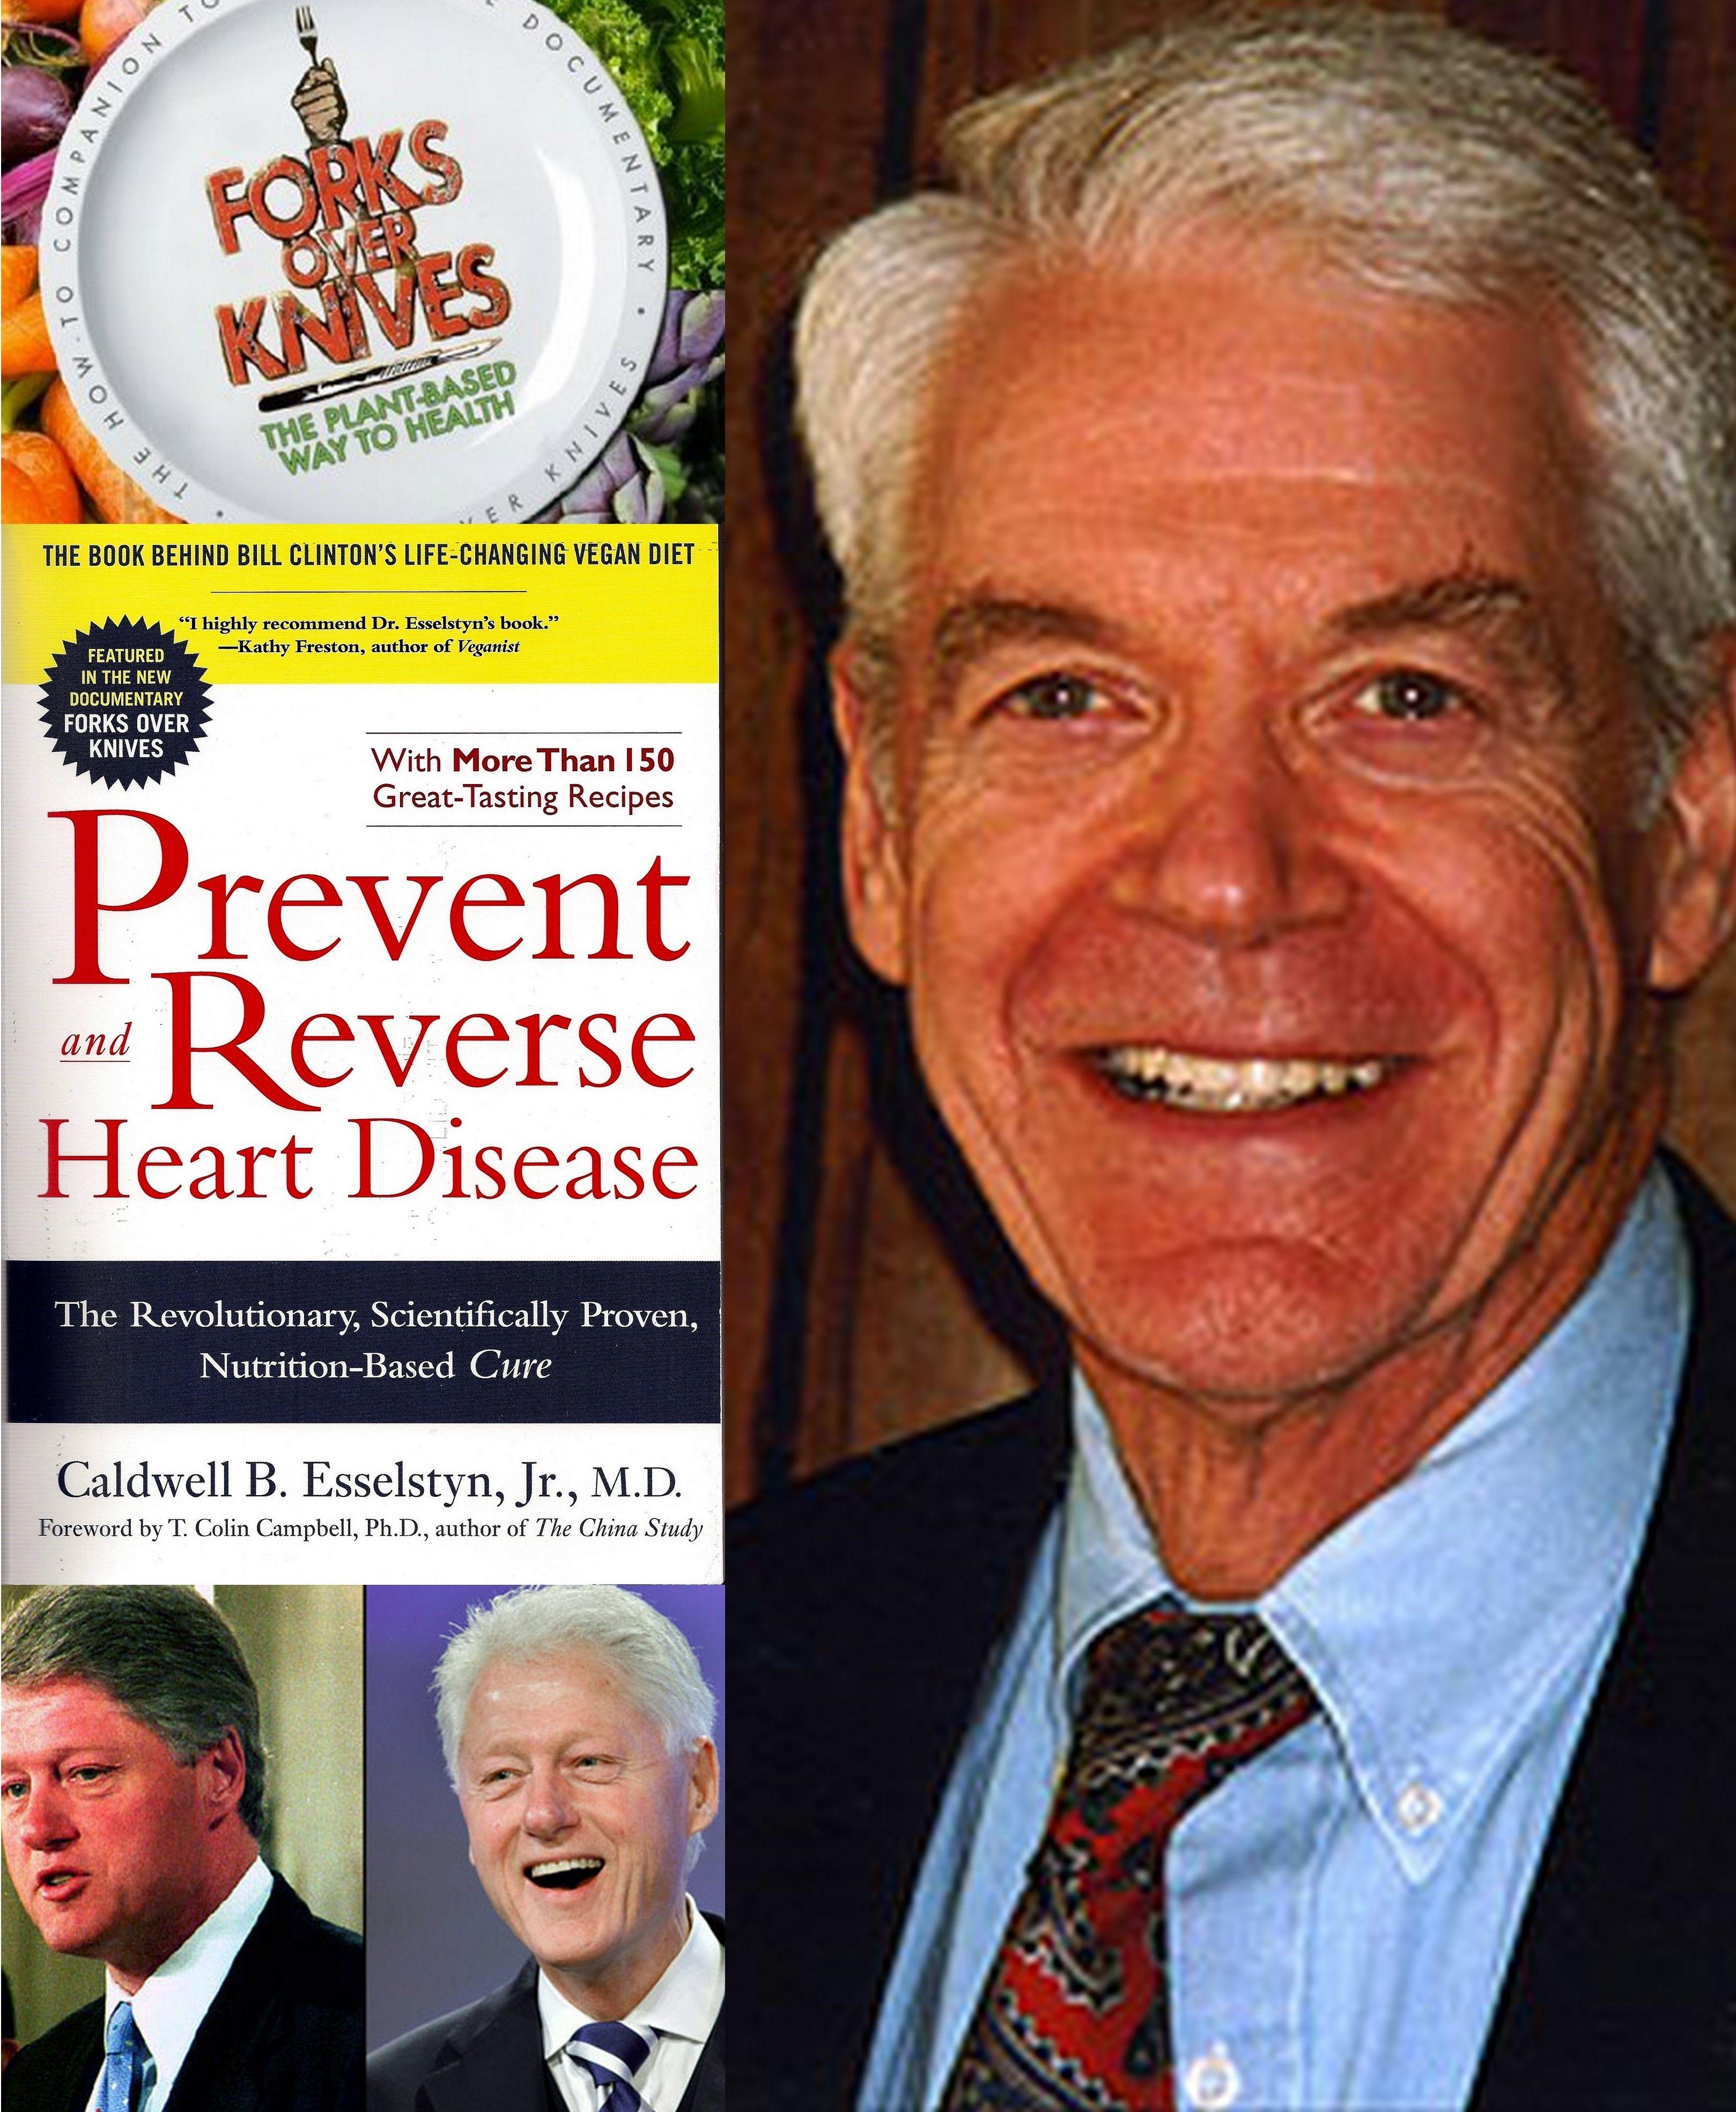 Dr Esselstyn Plant Based Diet Recipes Caldwell Why Vegan